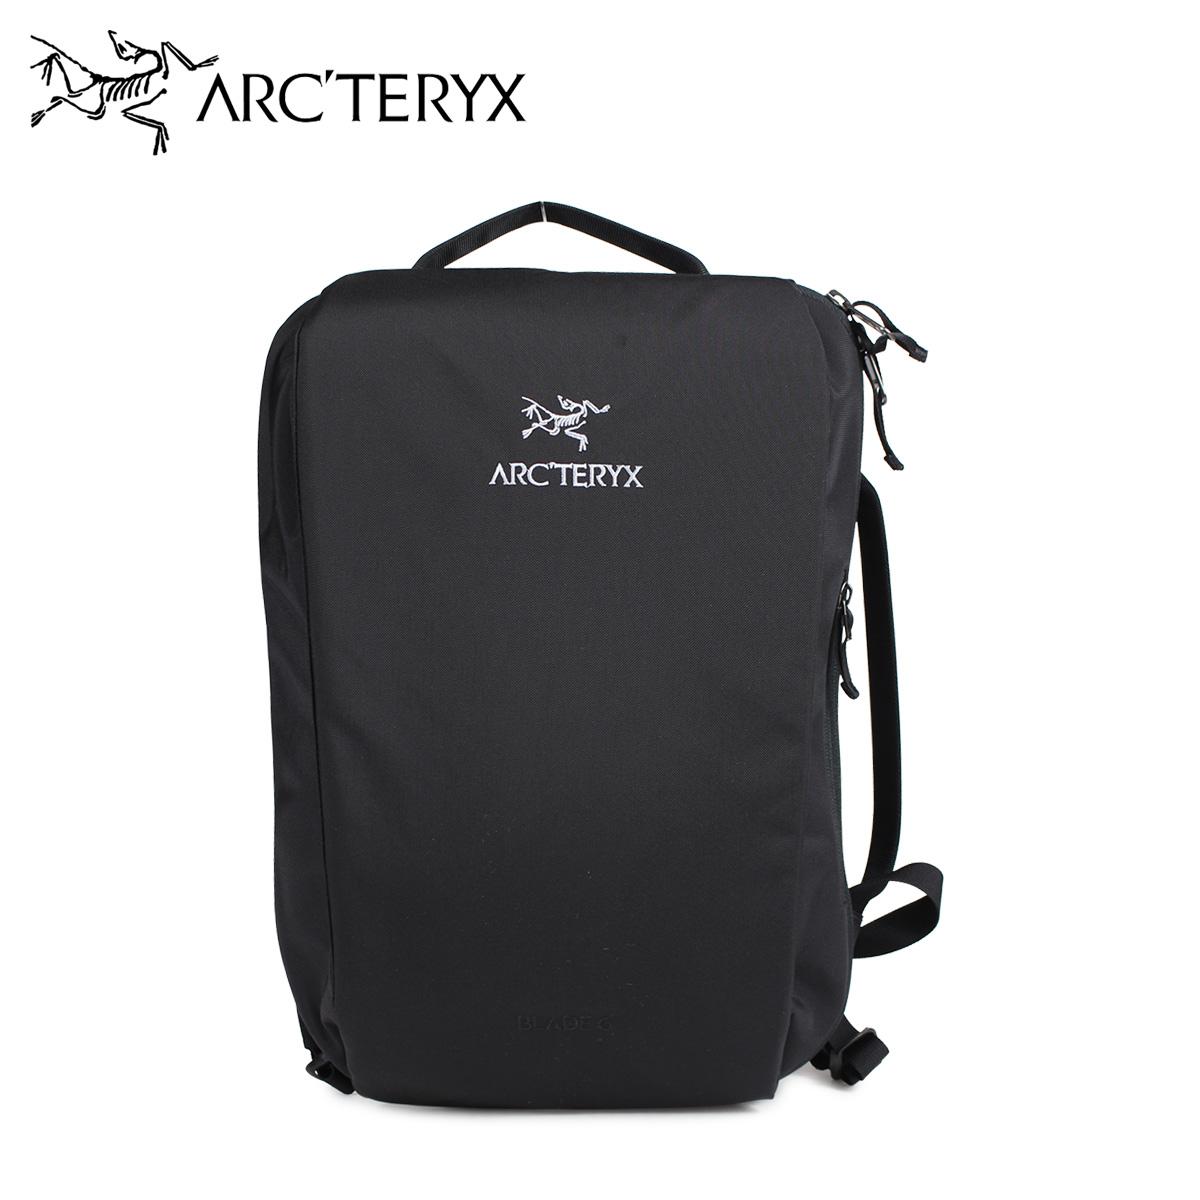 ARCTERYX BLADE 6 BACKPACK アークテリクス リュック バックパック バッグ ブレード 6 メンズ レディース 6L ブラック 黒 16180